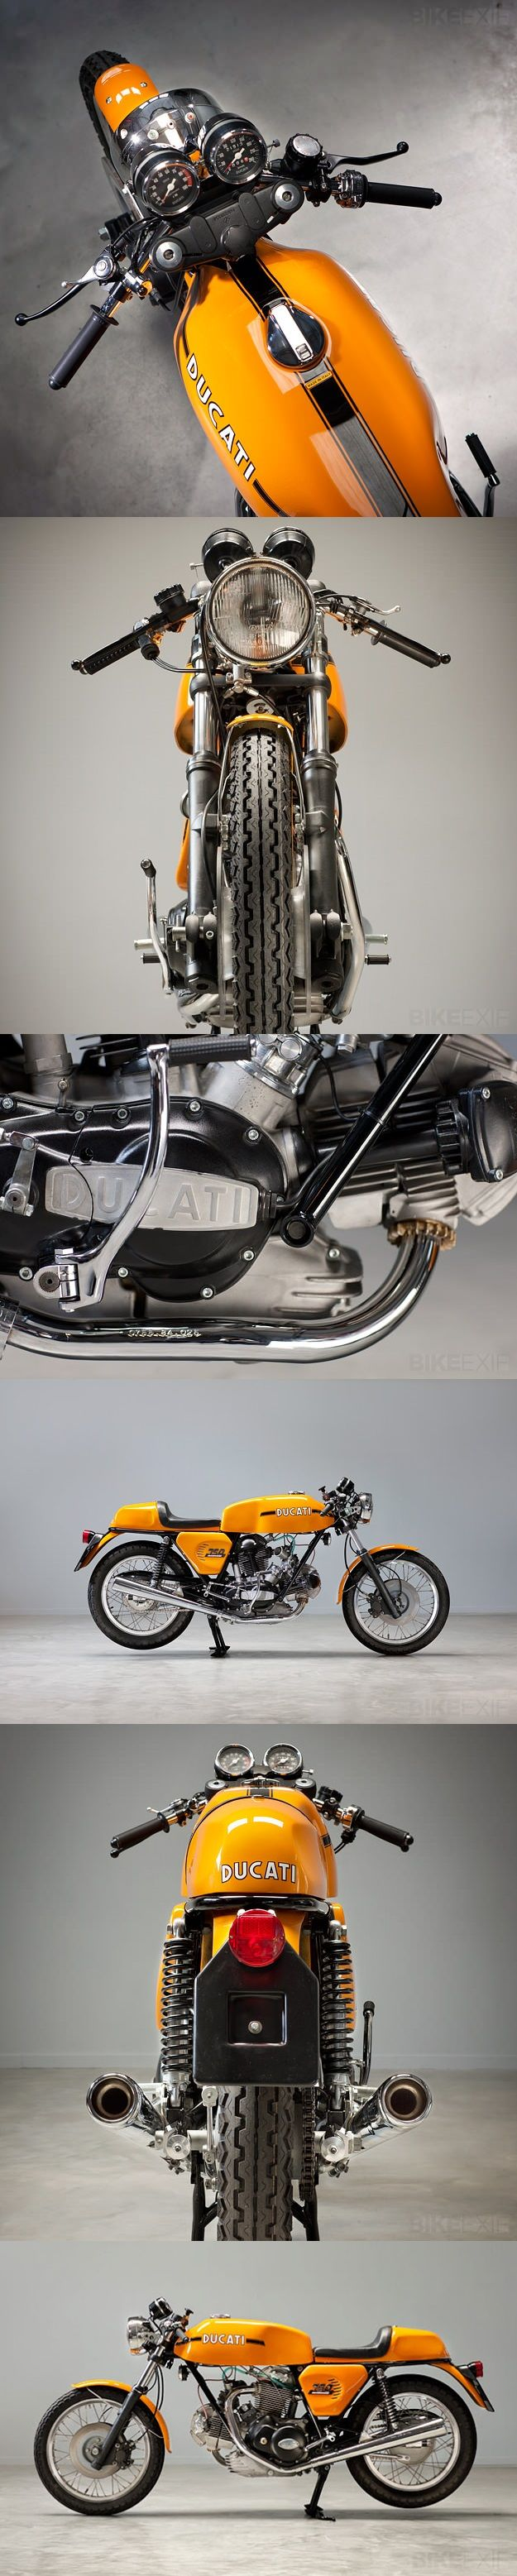 '73 #Ducati 750 Sport                                                                                                                                                                                 More